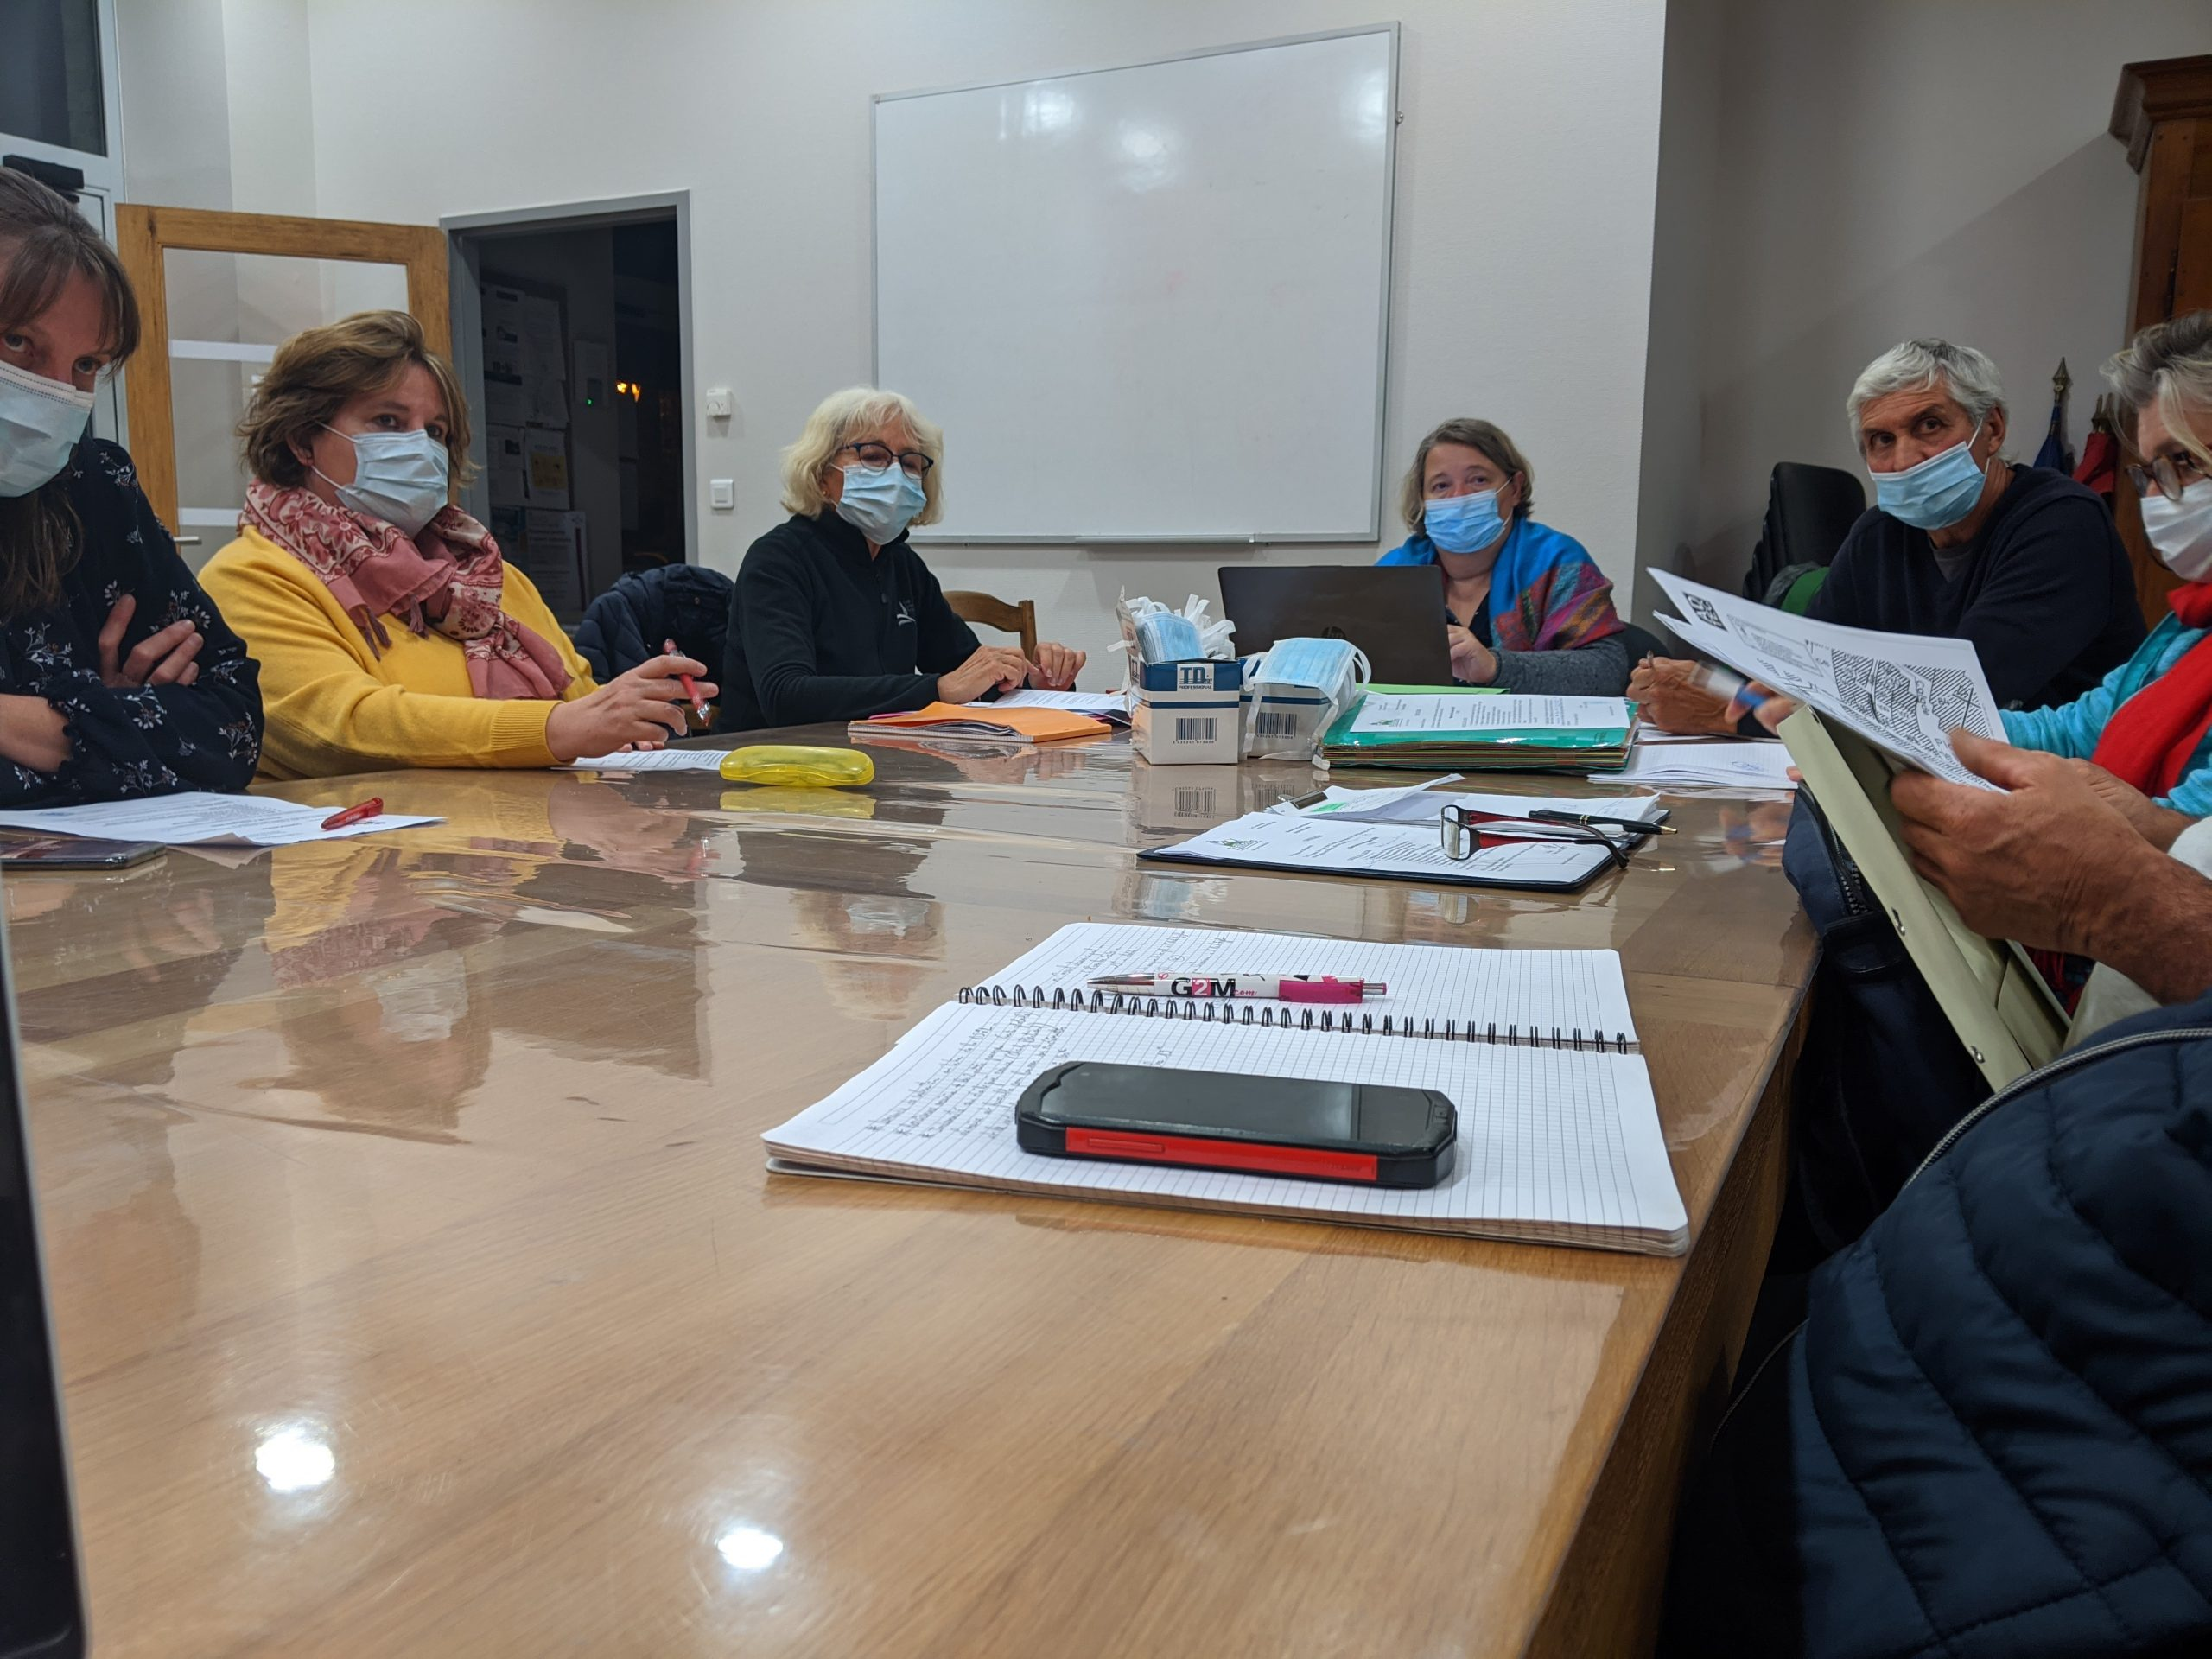 Conseil municipal du 4 novembre 2020 – Compte-rendu